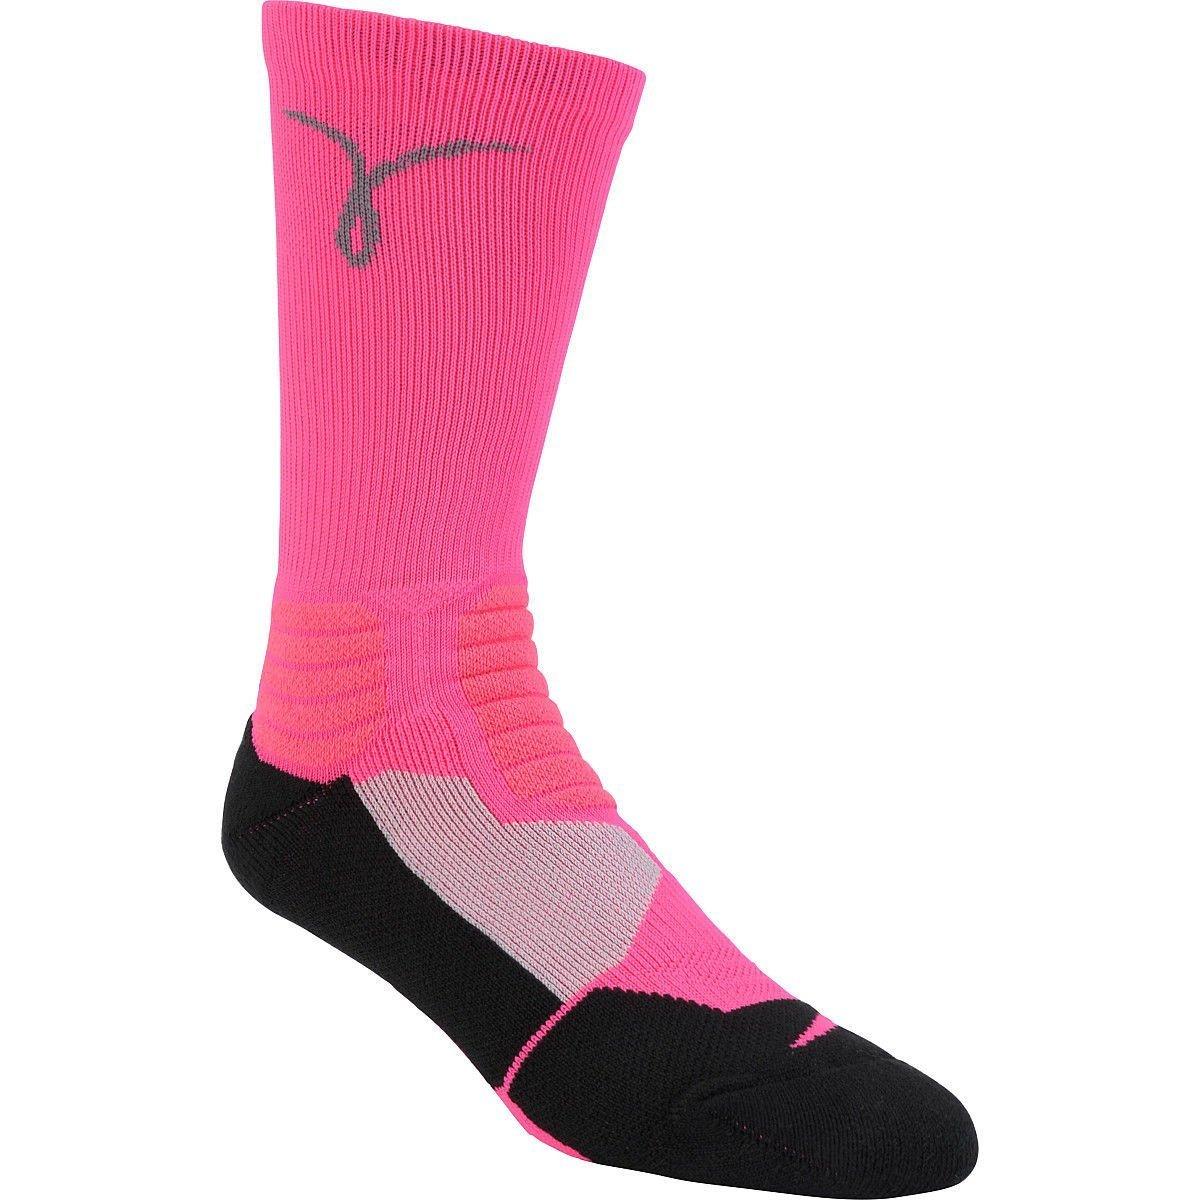 f4b3ac90da4ec Cheap Grey And Pink Elite Socks, find Grey And Pink Elite Socks ...